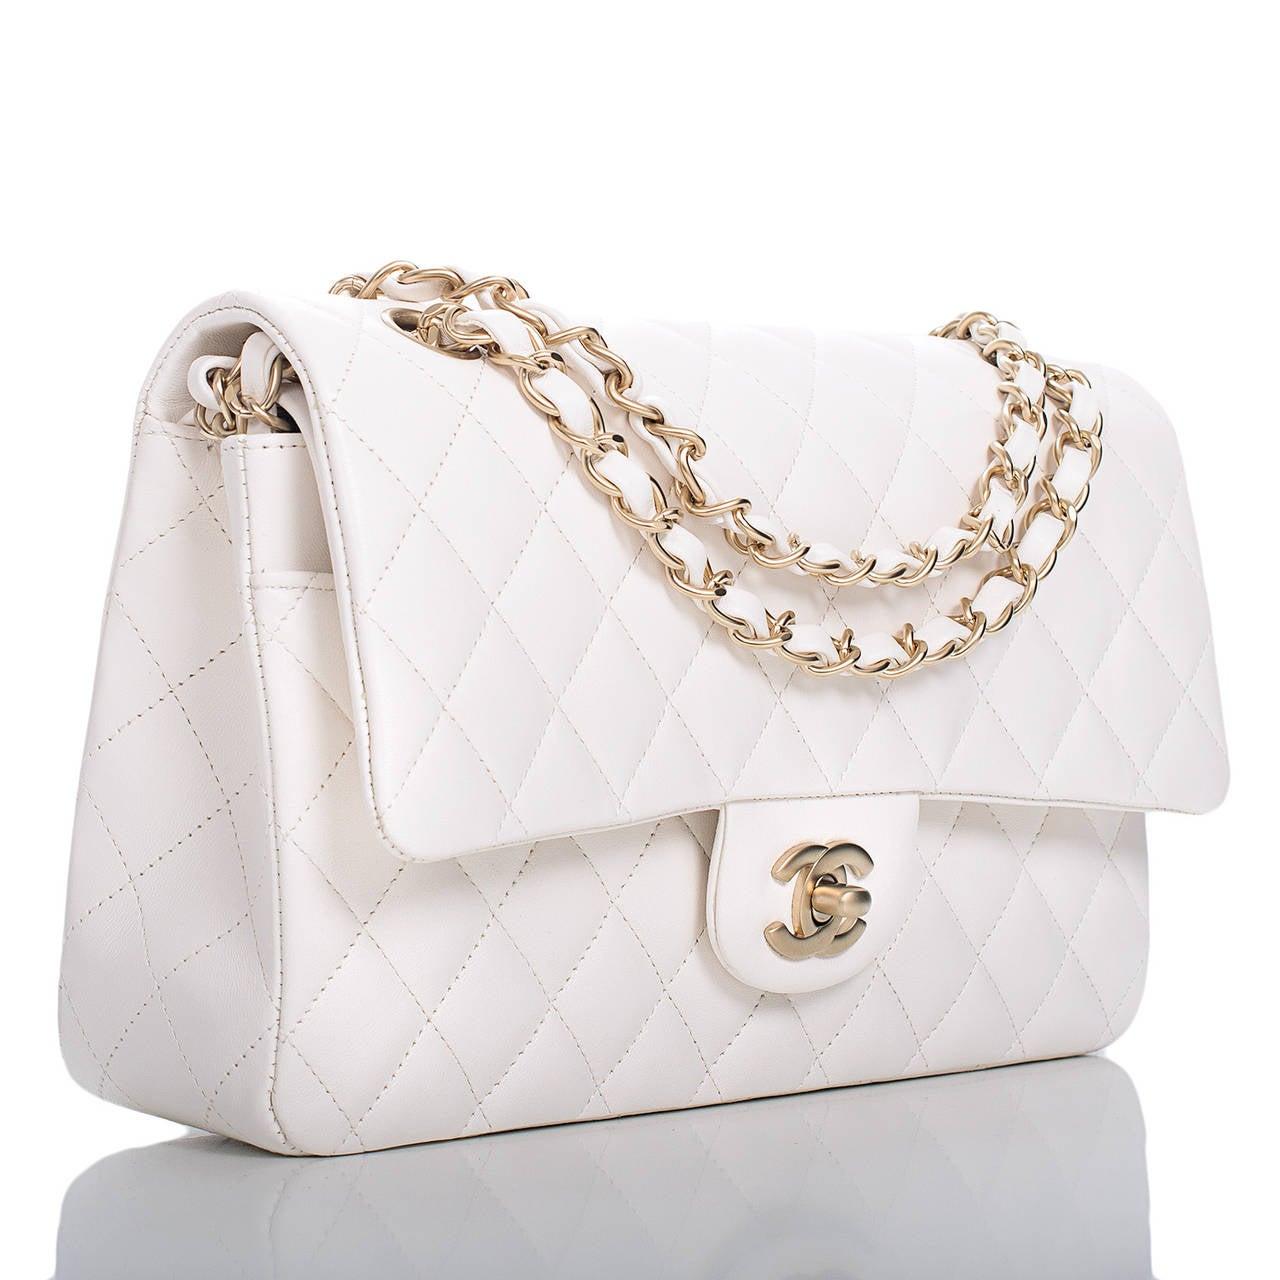 Chanel Bag Lambskin Bag Gold Hardware Chanel